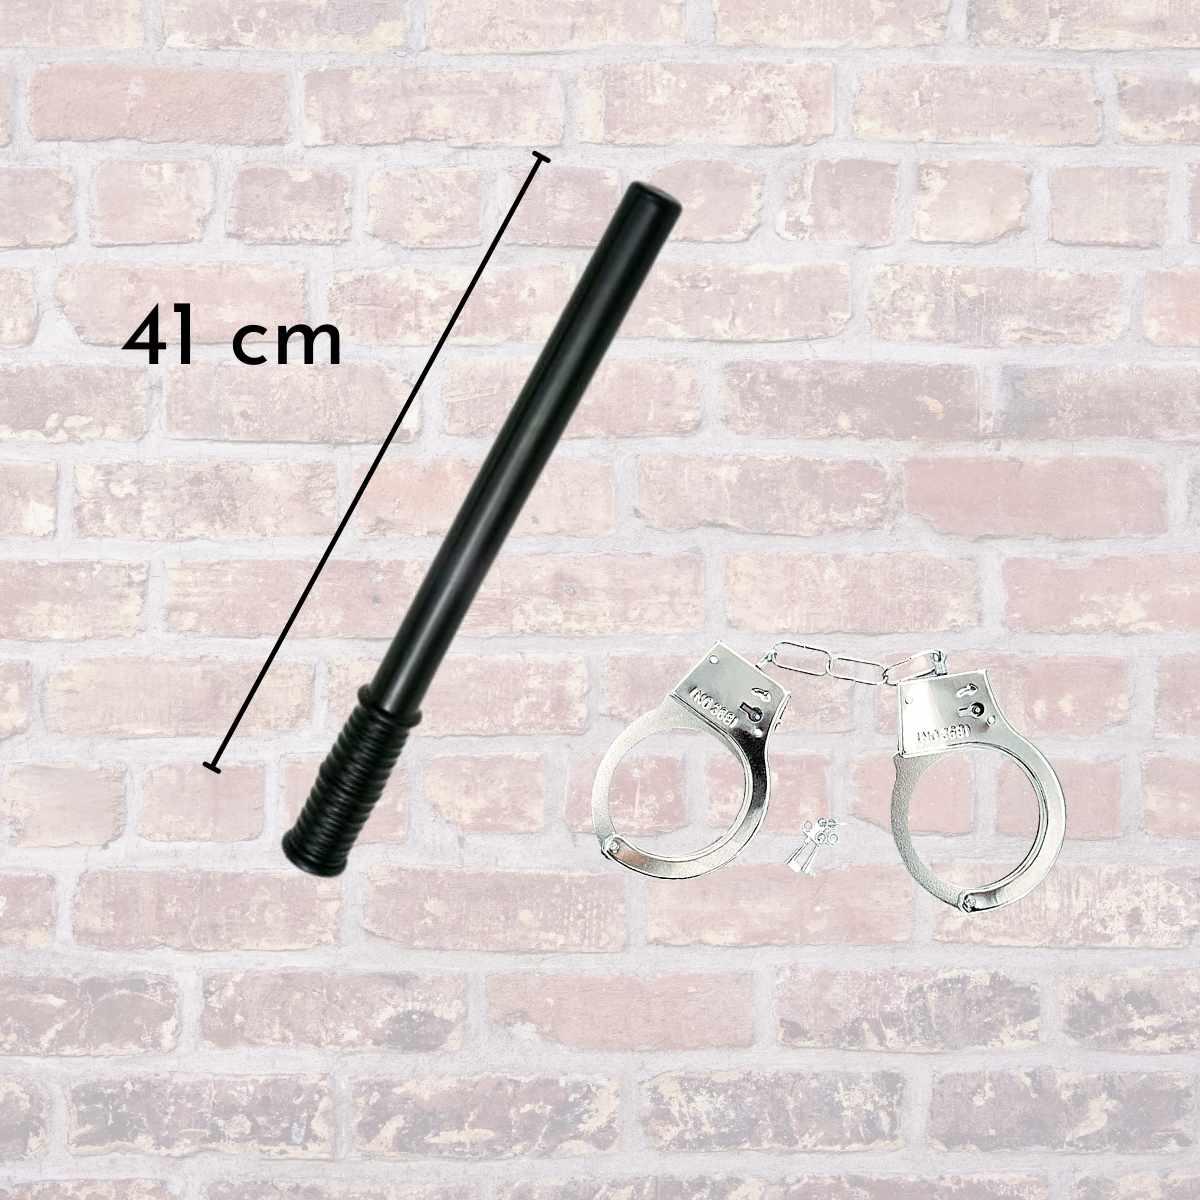 Kit Policial Adulto Feminino (Saia de Tule Preta + Quepe + Algema + Cassetete + Suspensório Preto + Óculos Policial)